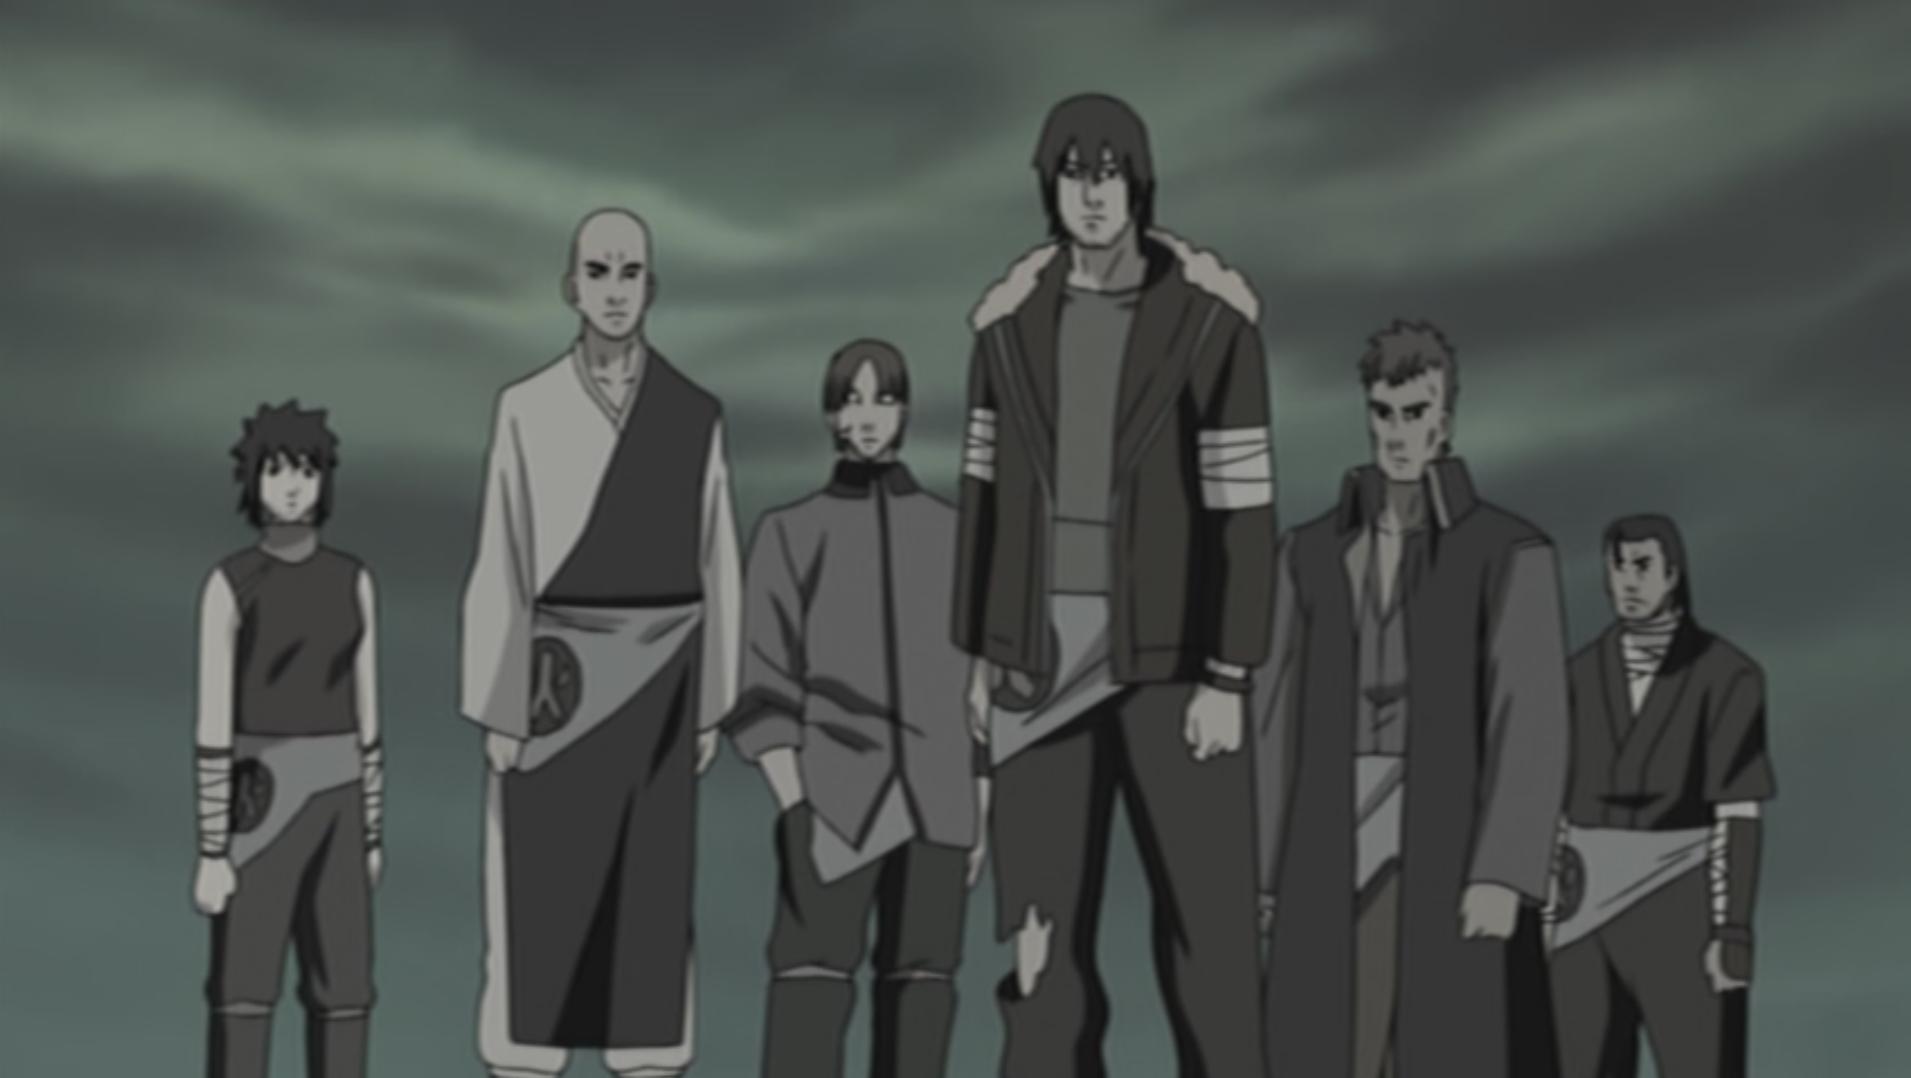 Doze Guardiões Ninja (Arco)